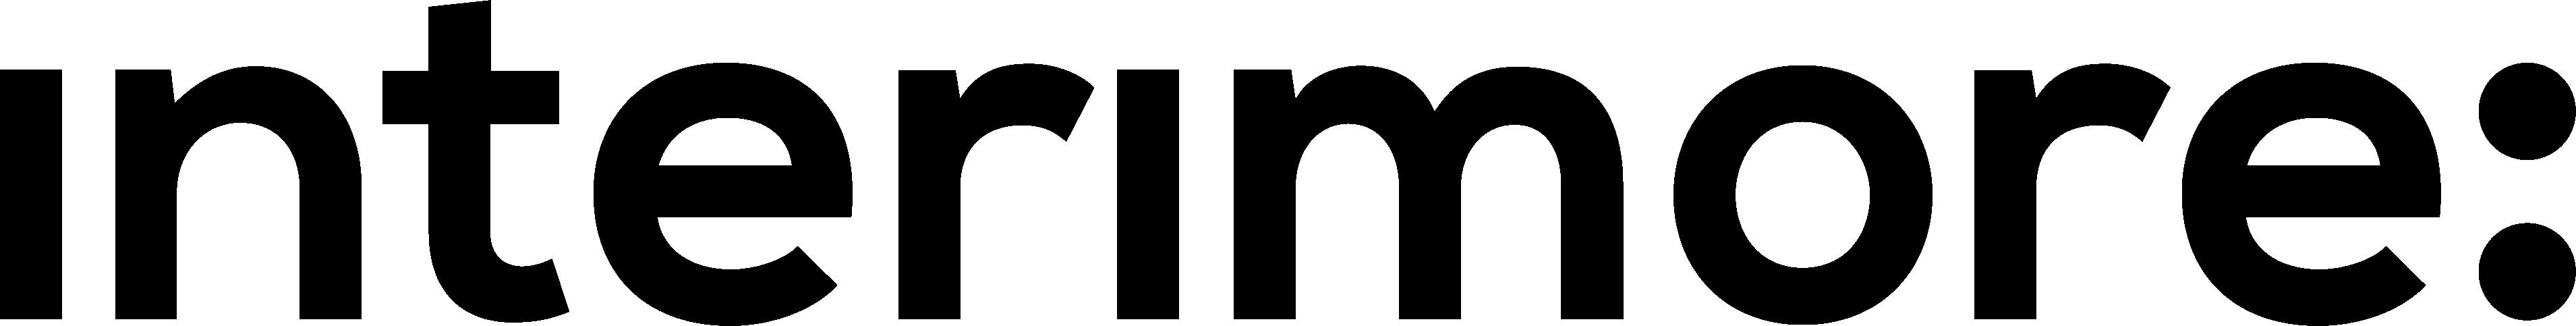 Minimalist and memorable logo for online interior design service